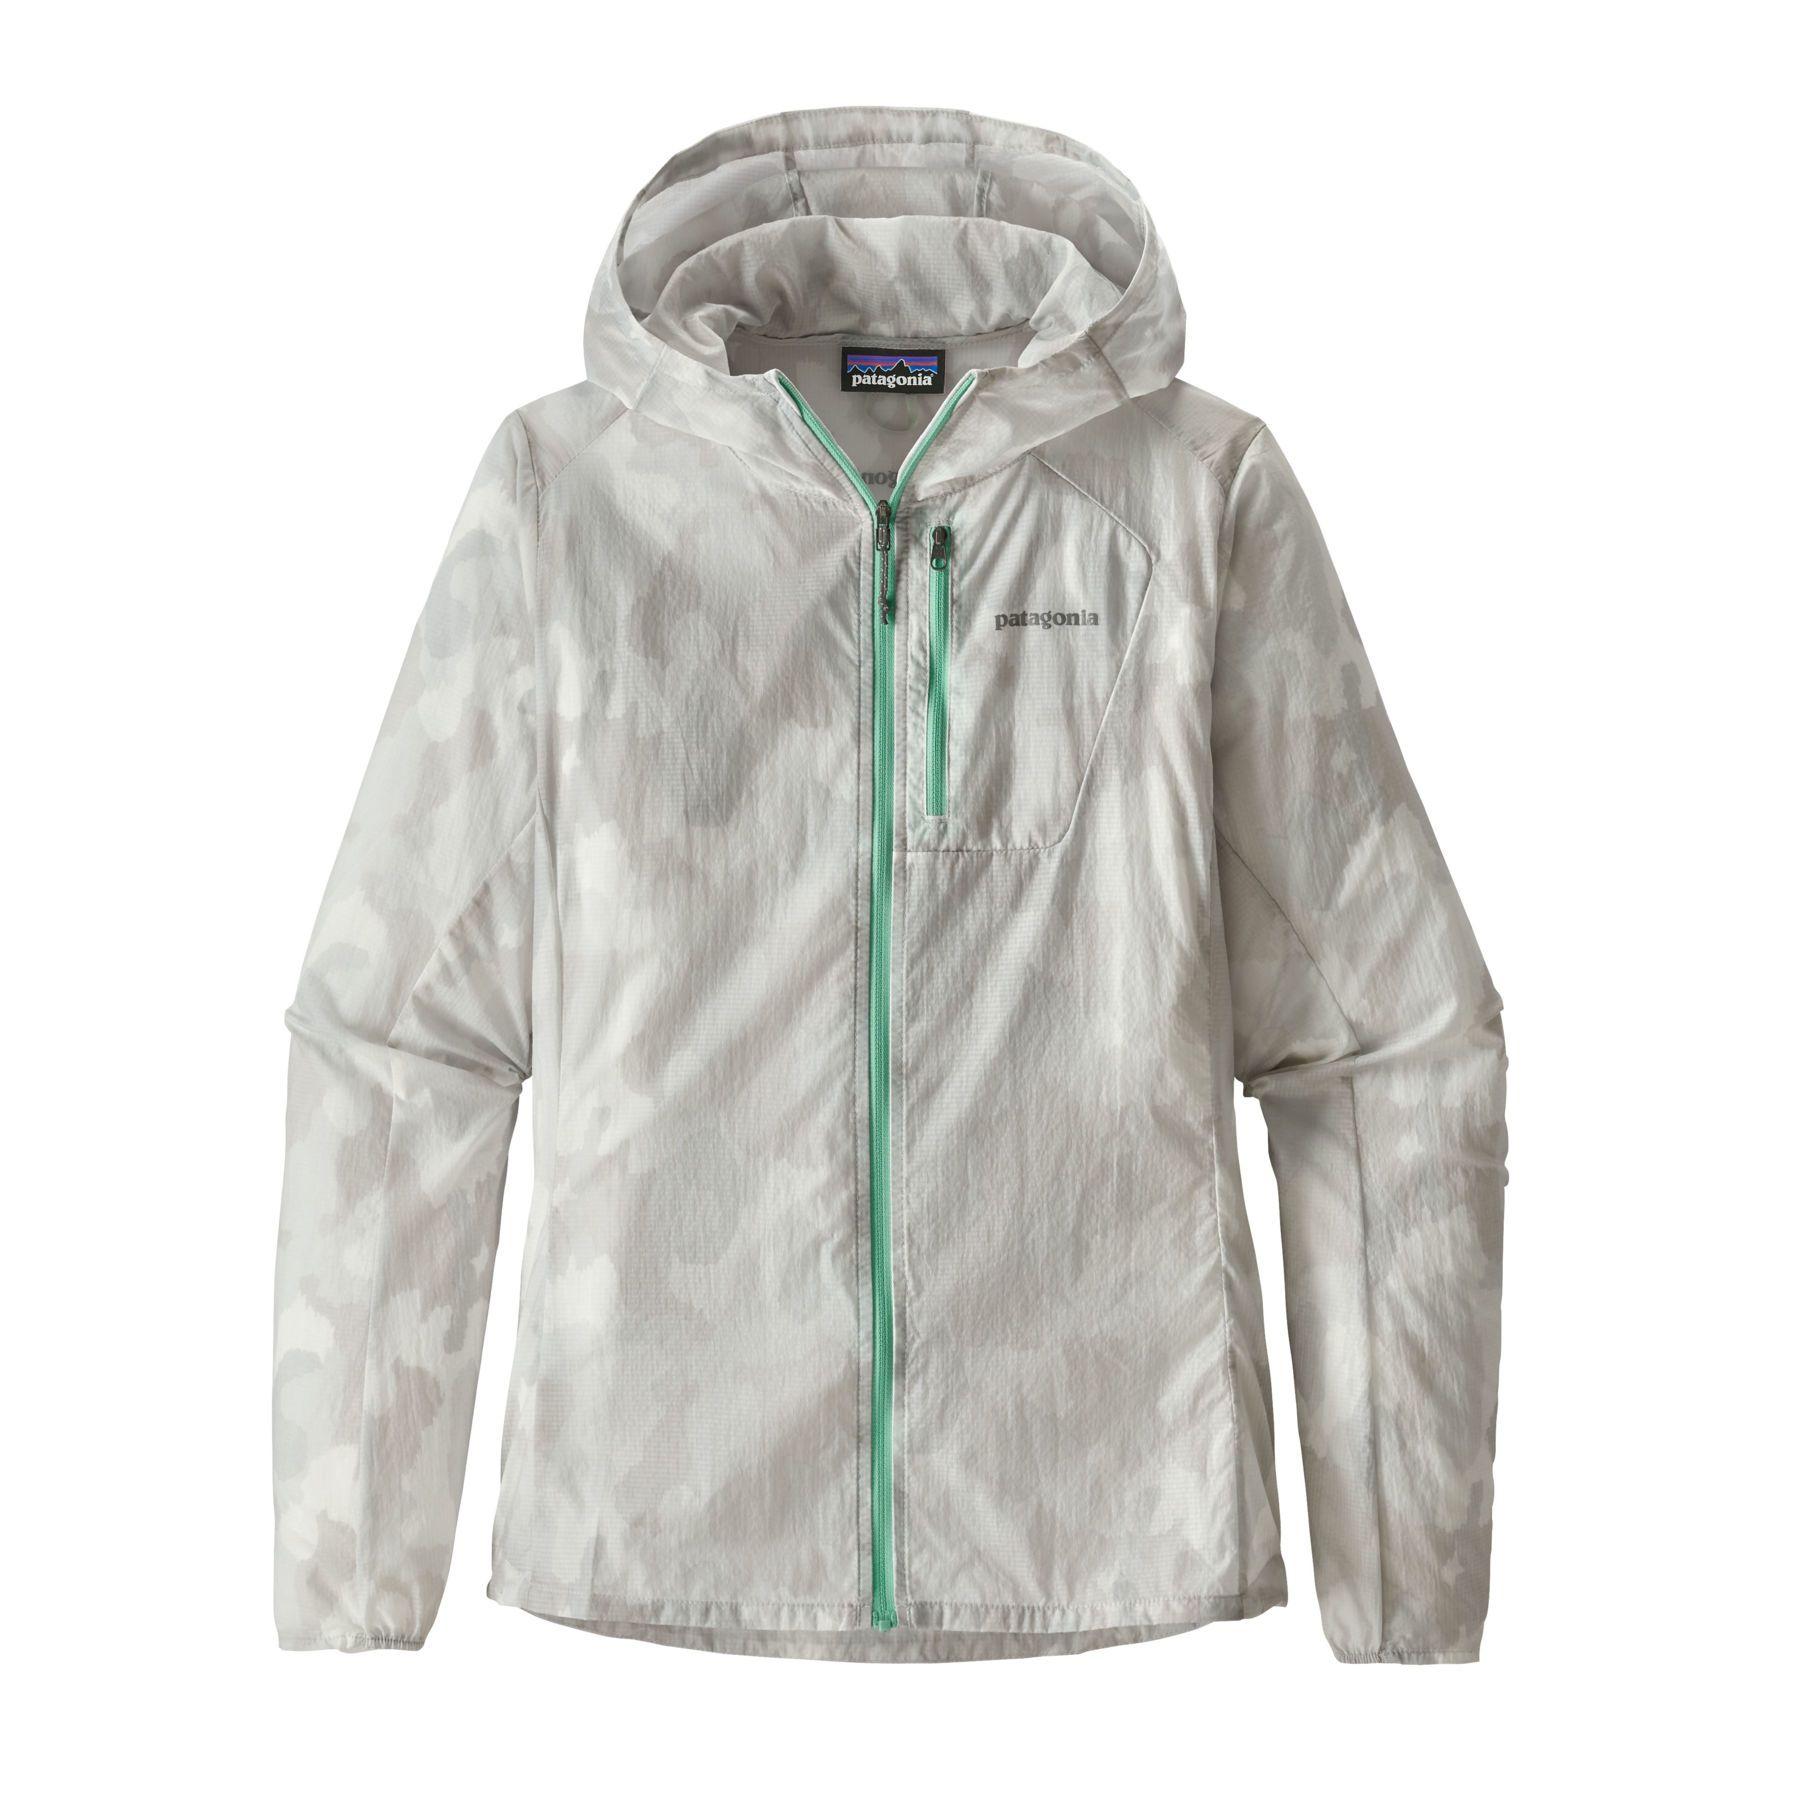 Patagonia Houdini Women's Jacket Jackets for women